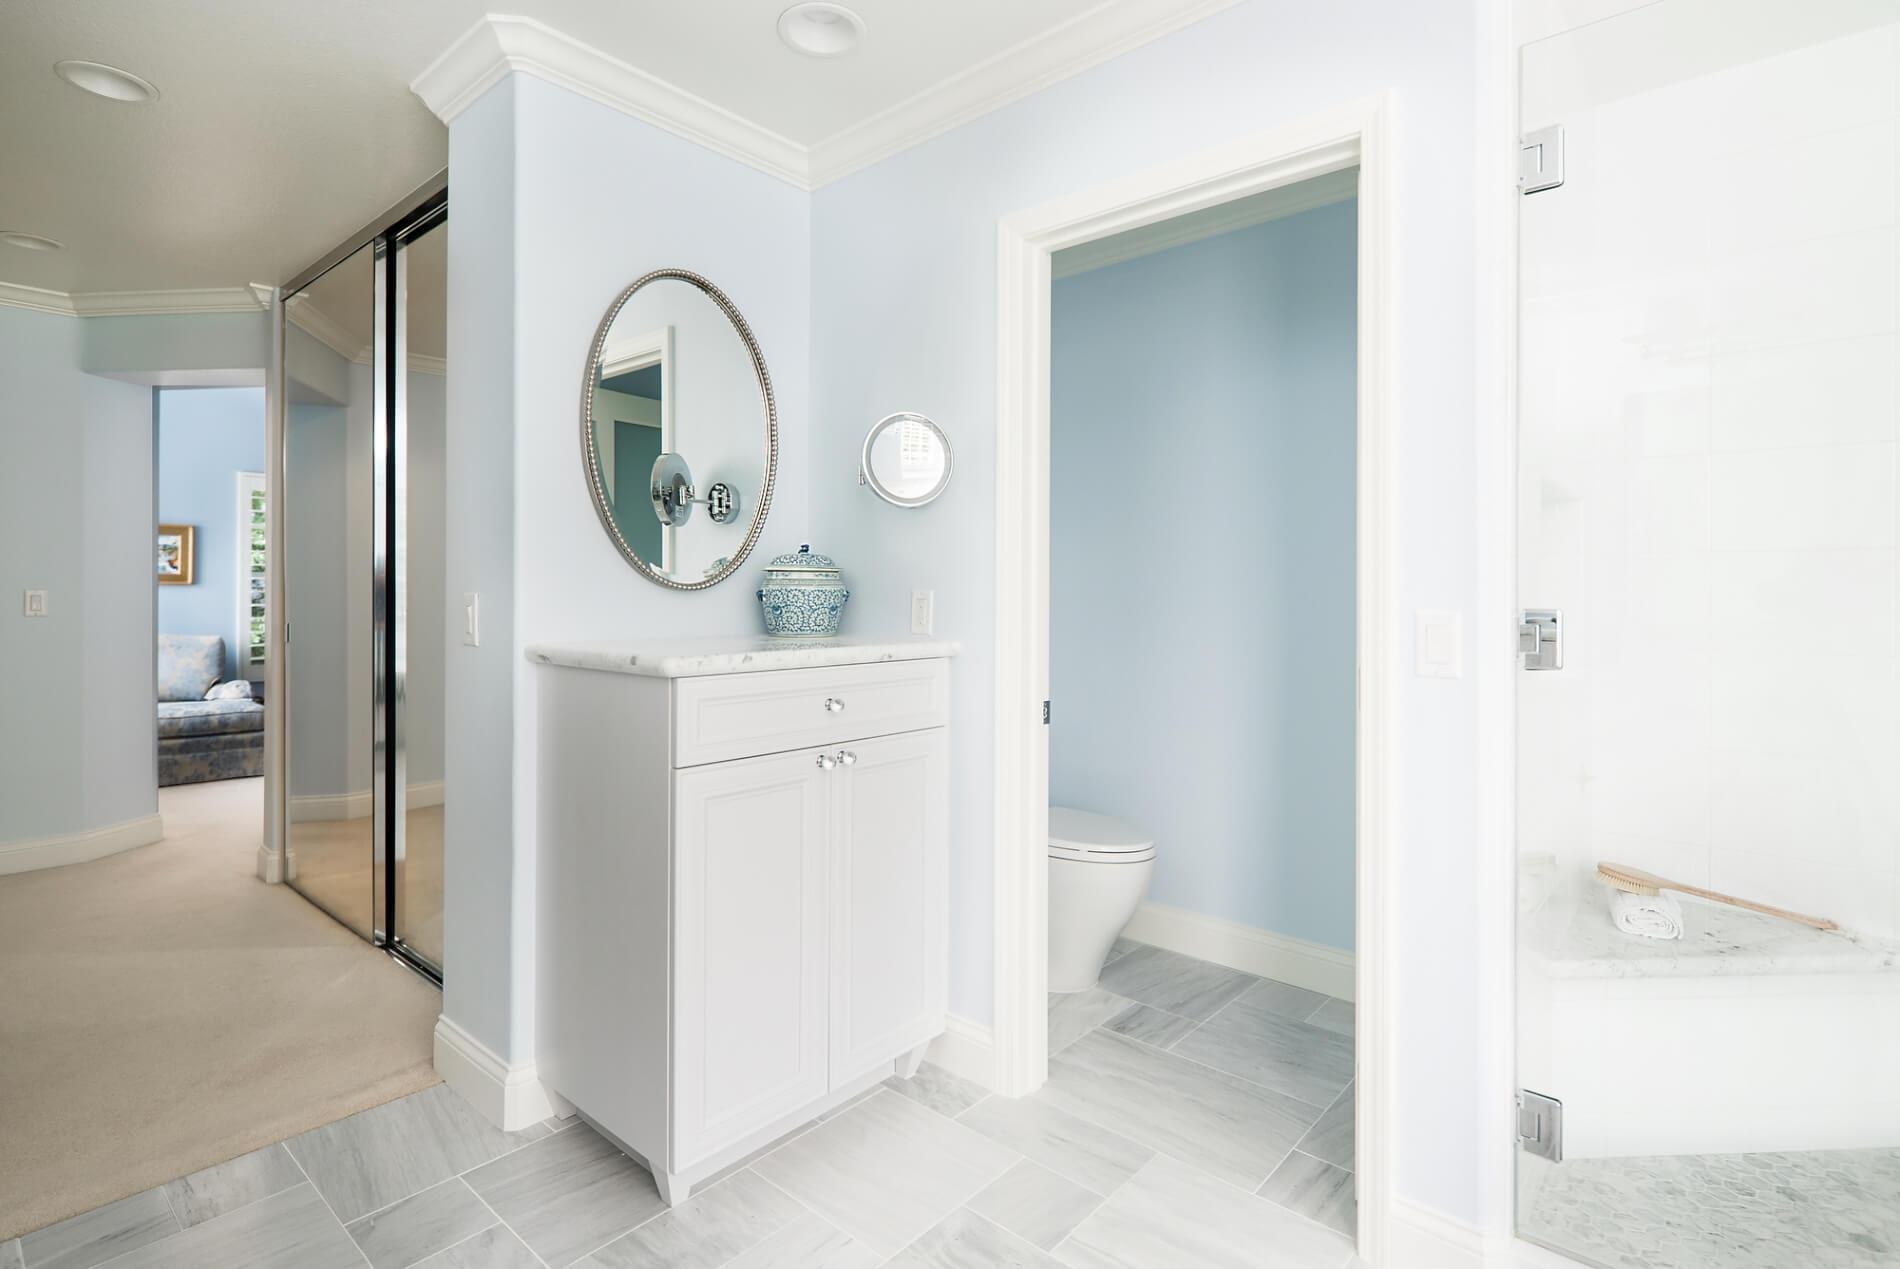 Custom Bathroom Design, Bathroom Renovation Companies, Bathroom Renovation in Orange County